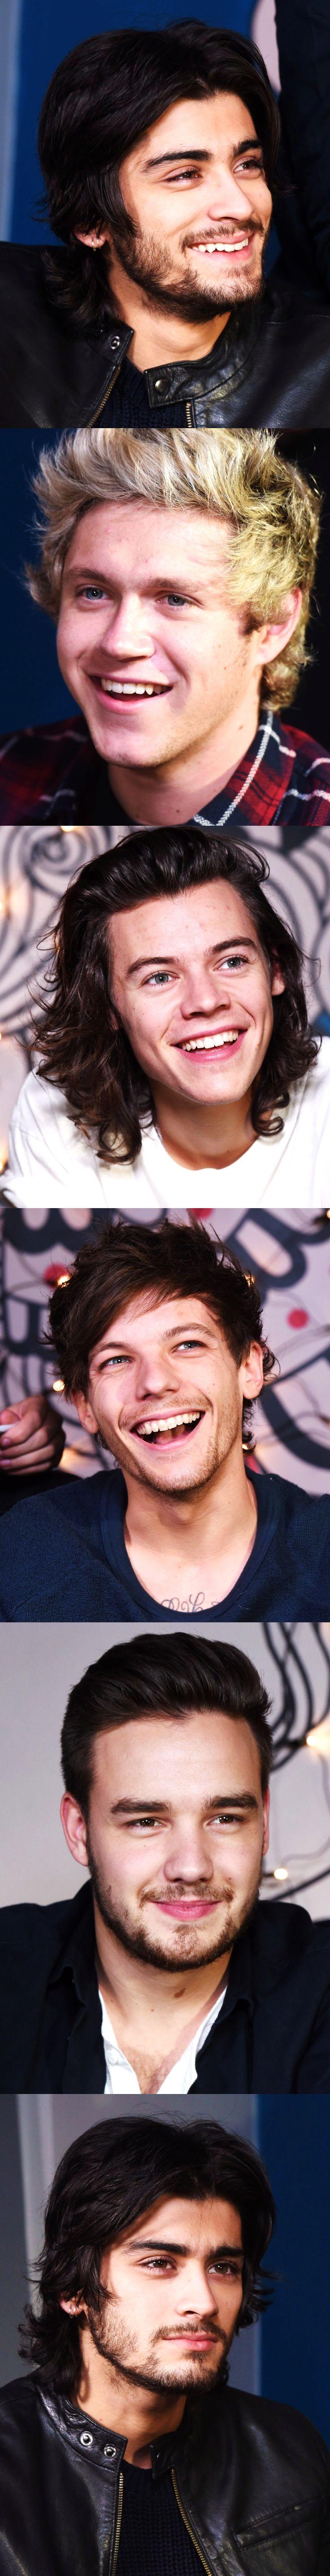 One Direction / Zayn Malik / Liam Payne / Niall Horan / Louis Tomlinson / Harry Styles